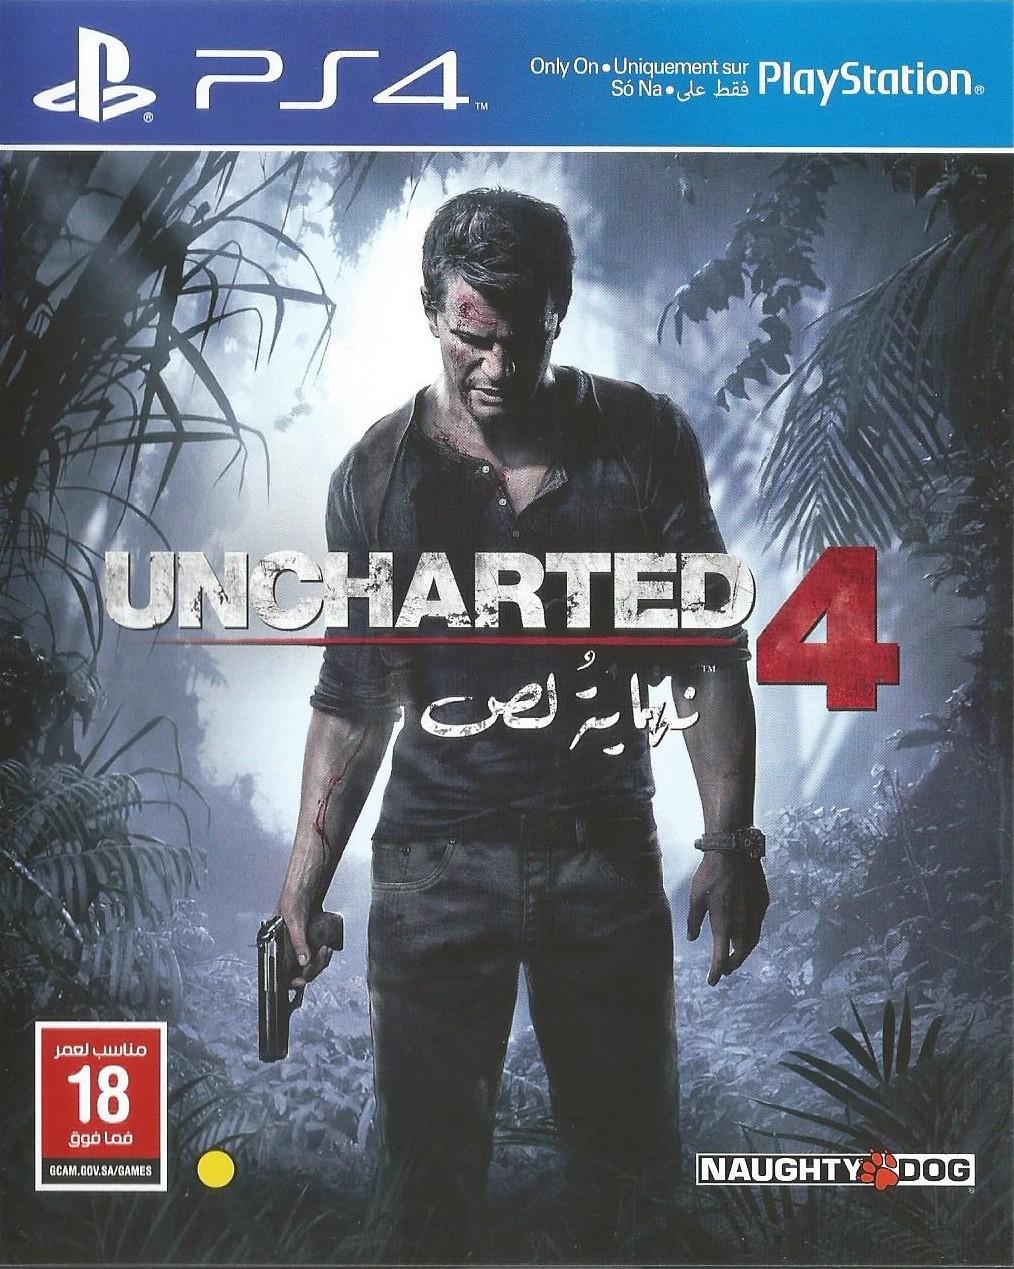 uncharted 4 تحميل لعبة